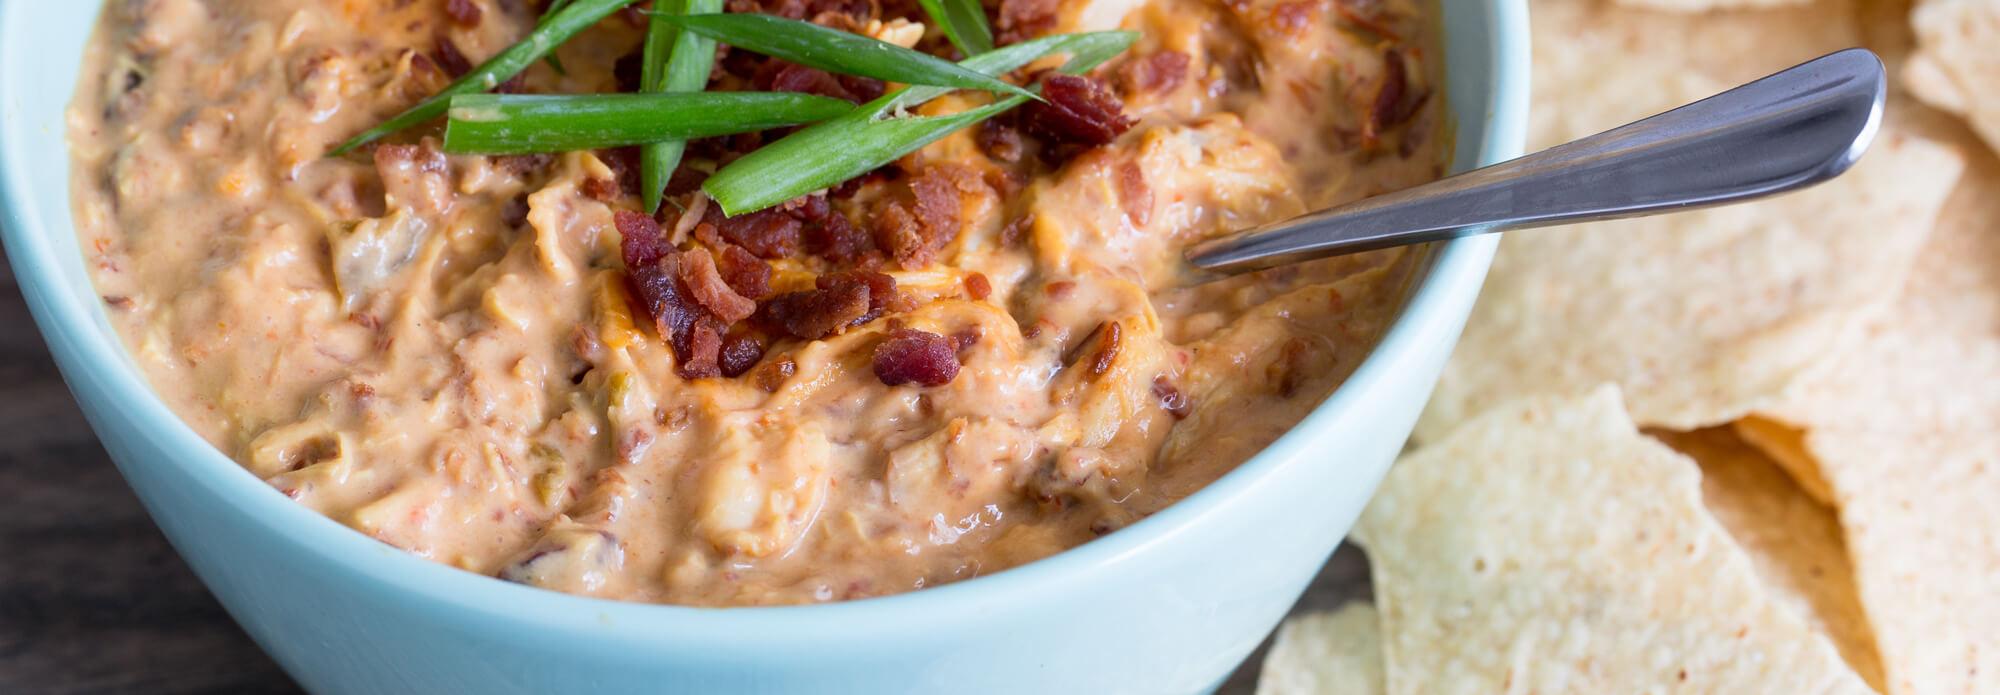 Salsas cheesy chicken and bacon dip